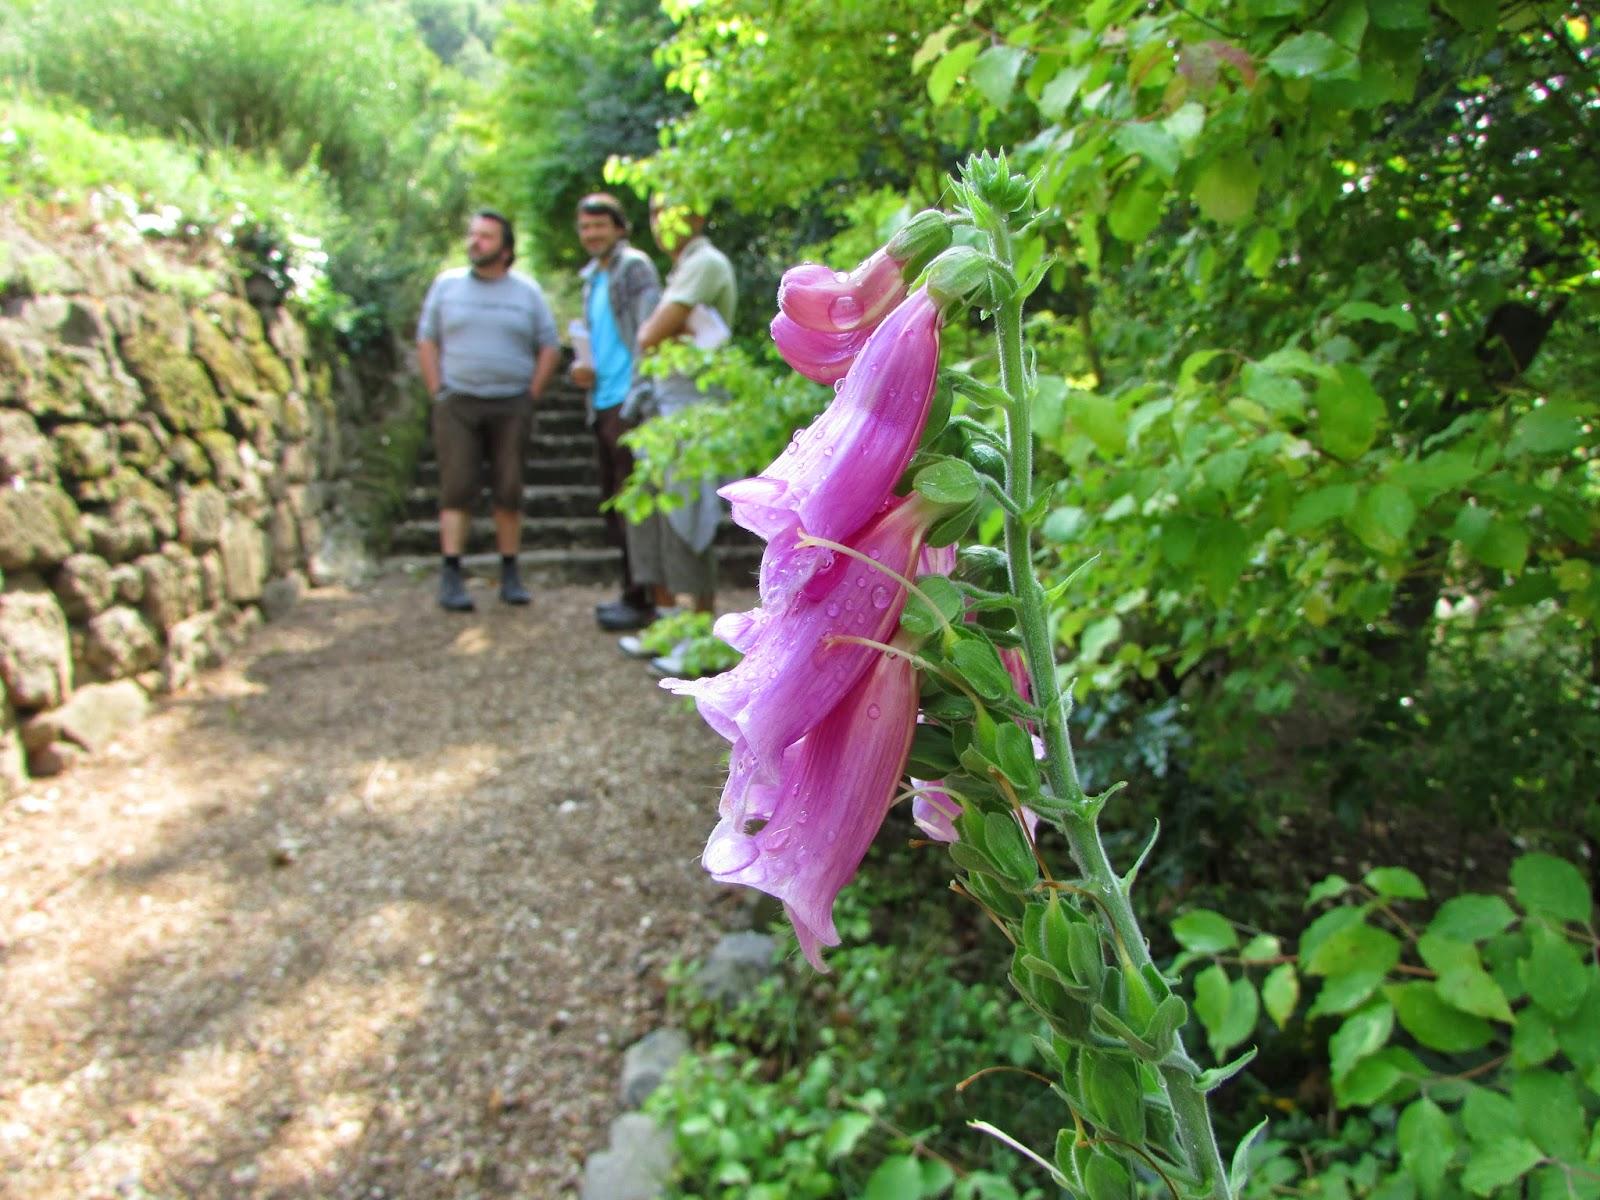 Jardin partag fdb visite dans le jardin d 39 orbeil for Jardin 63